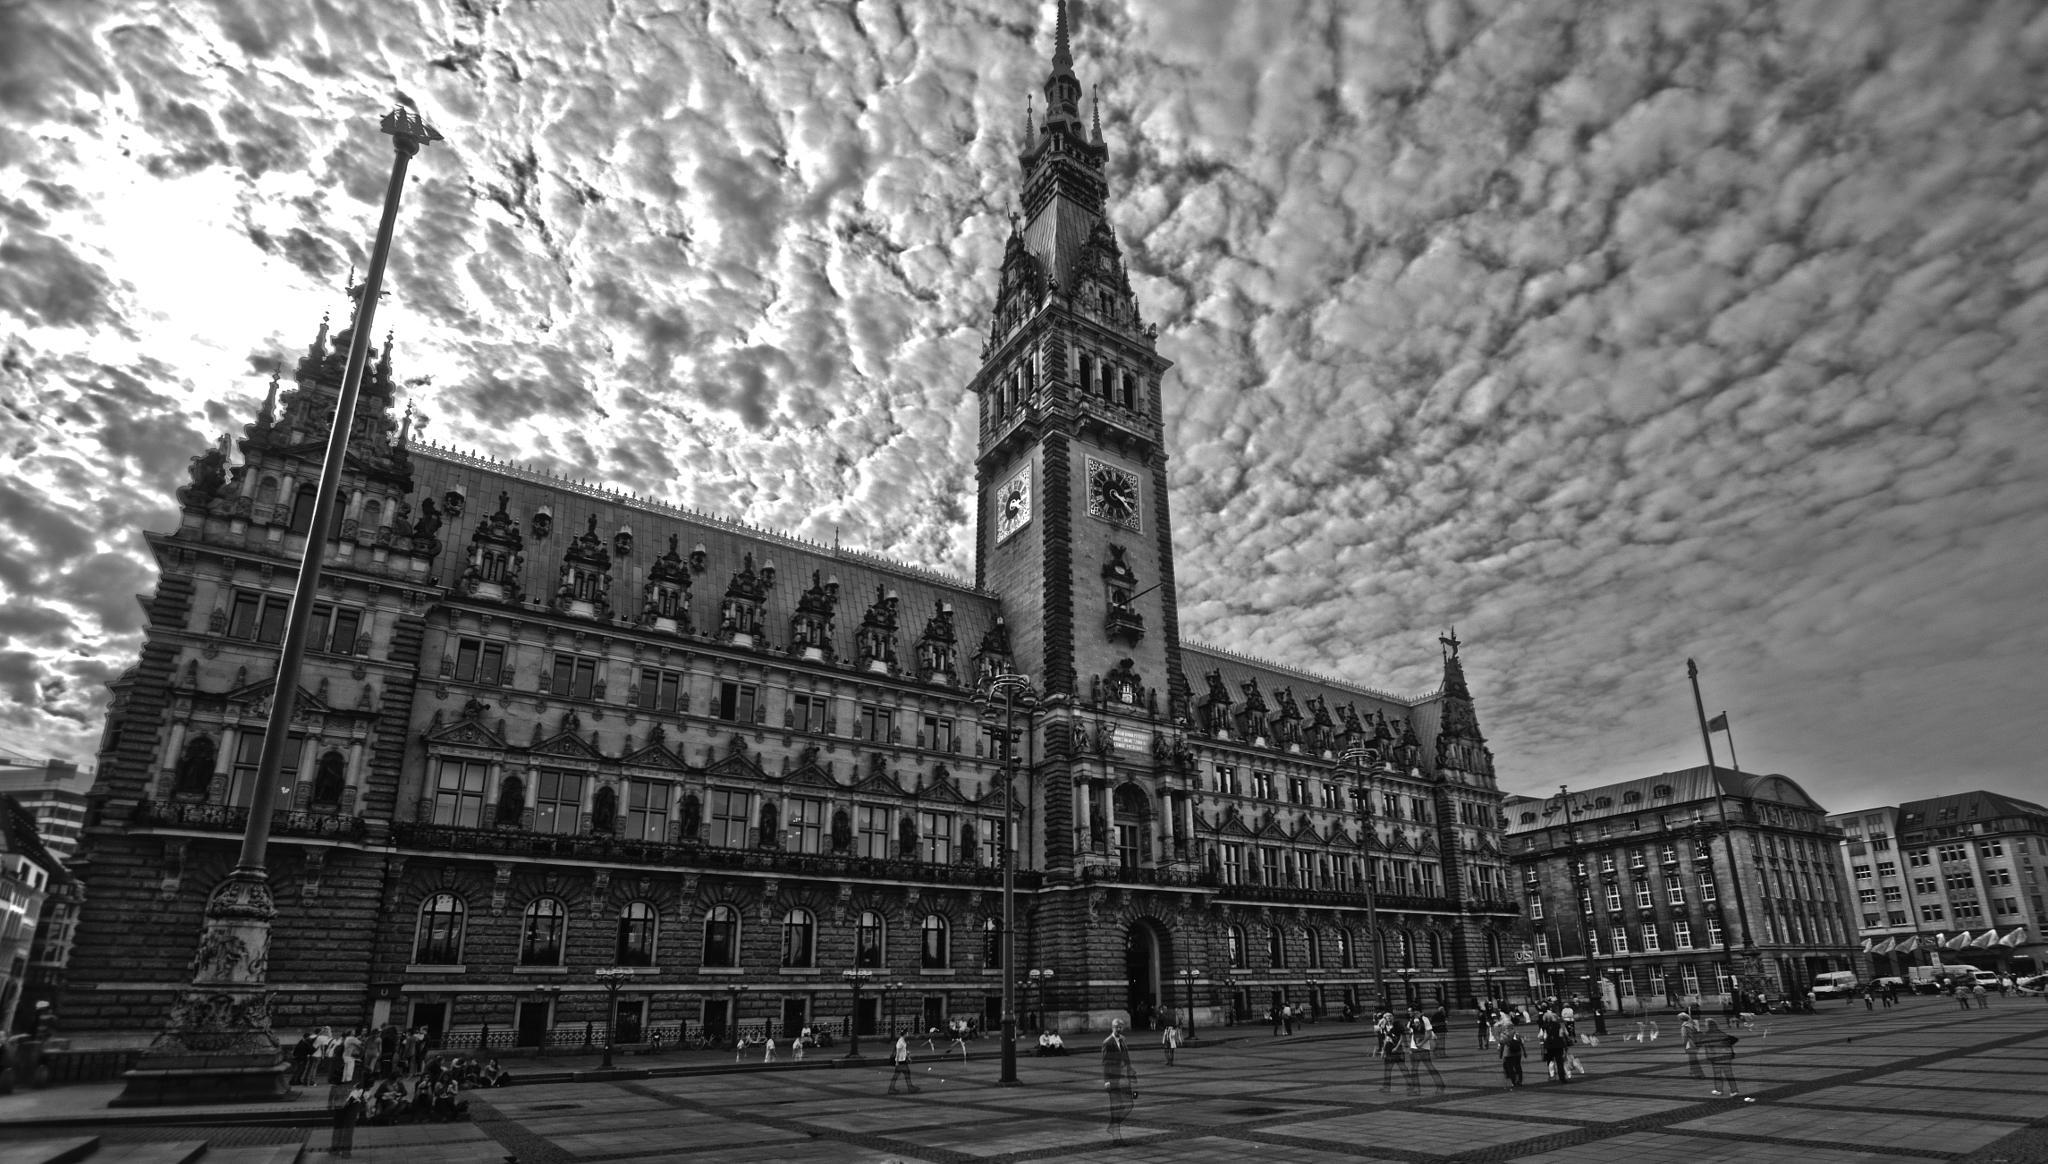 Rathaus >< Hamburg by Jose Luis Hidalgo